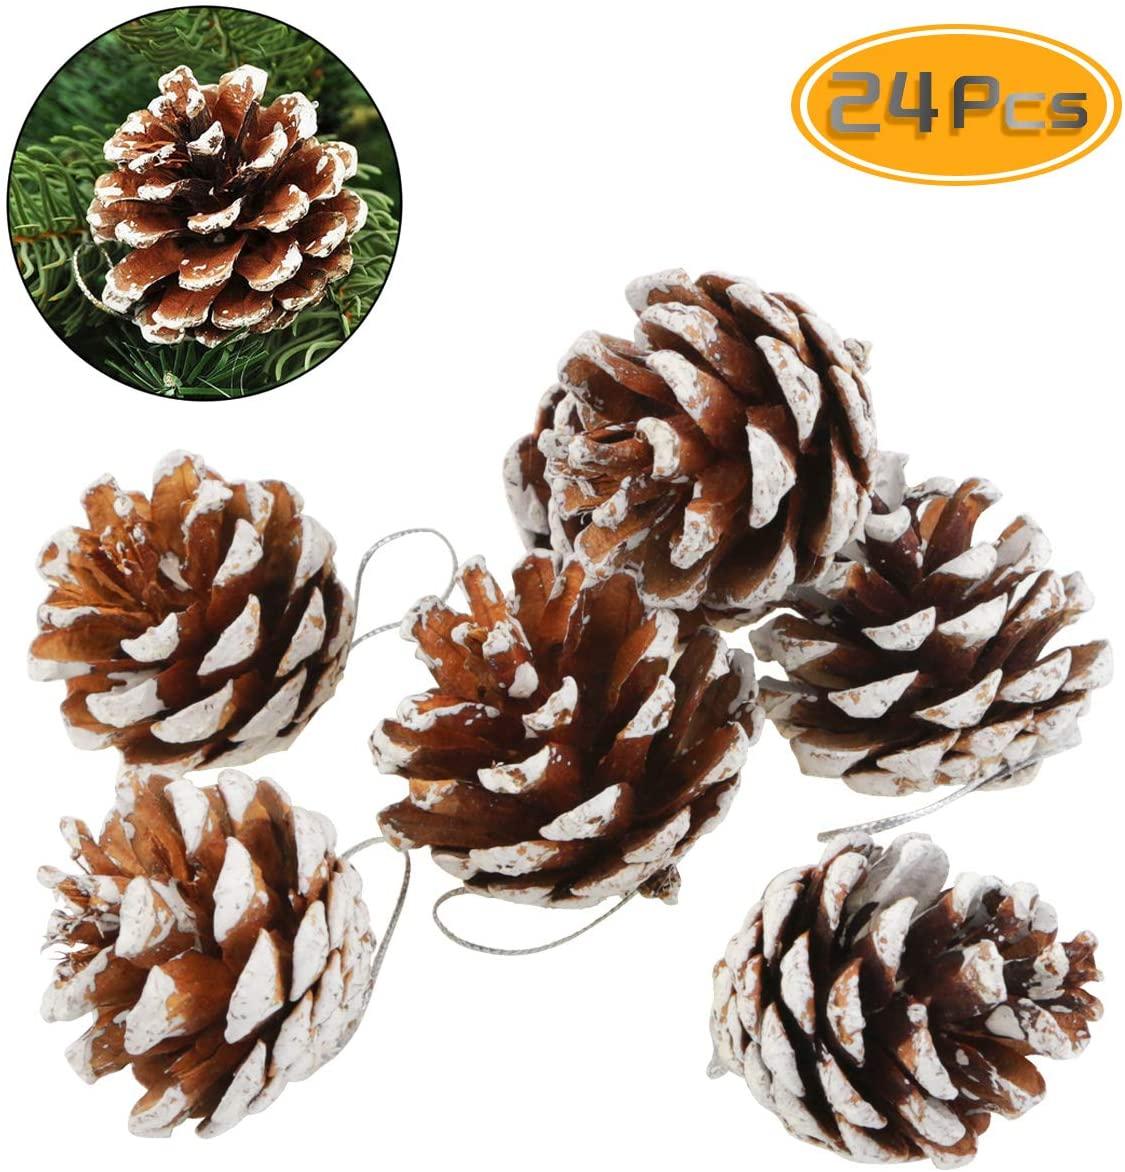 BeautyMood 24 pcs Natural Pine Cone Christmas Pine Cone Ornaments Christmas Tree Decorations – Snowflake. (Snowflake)